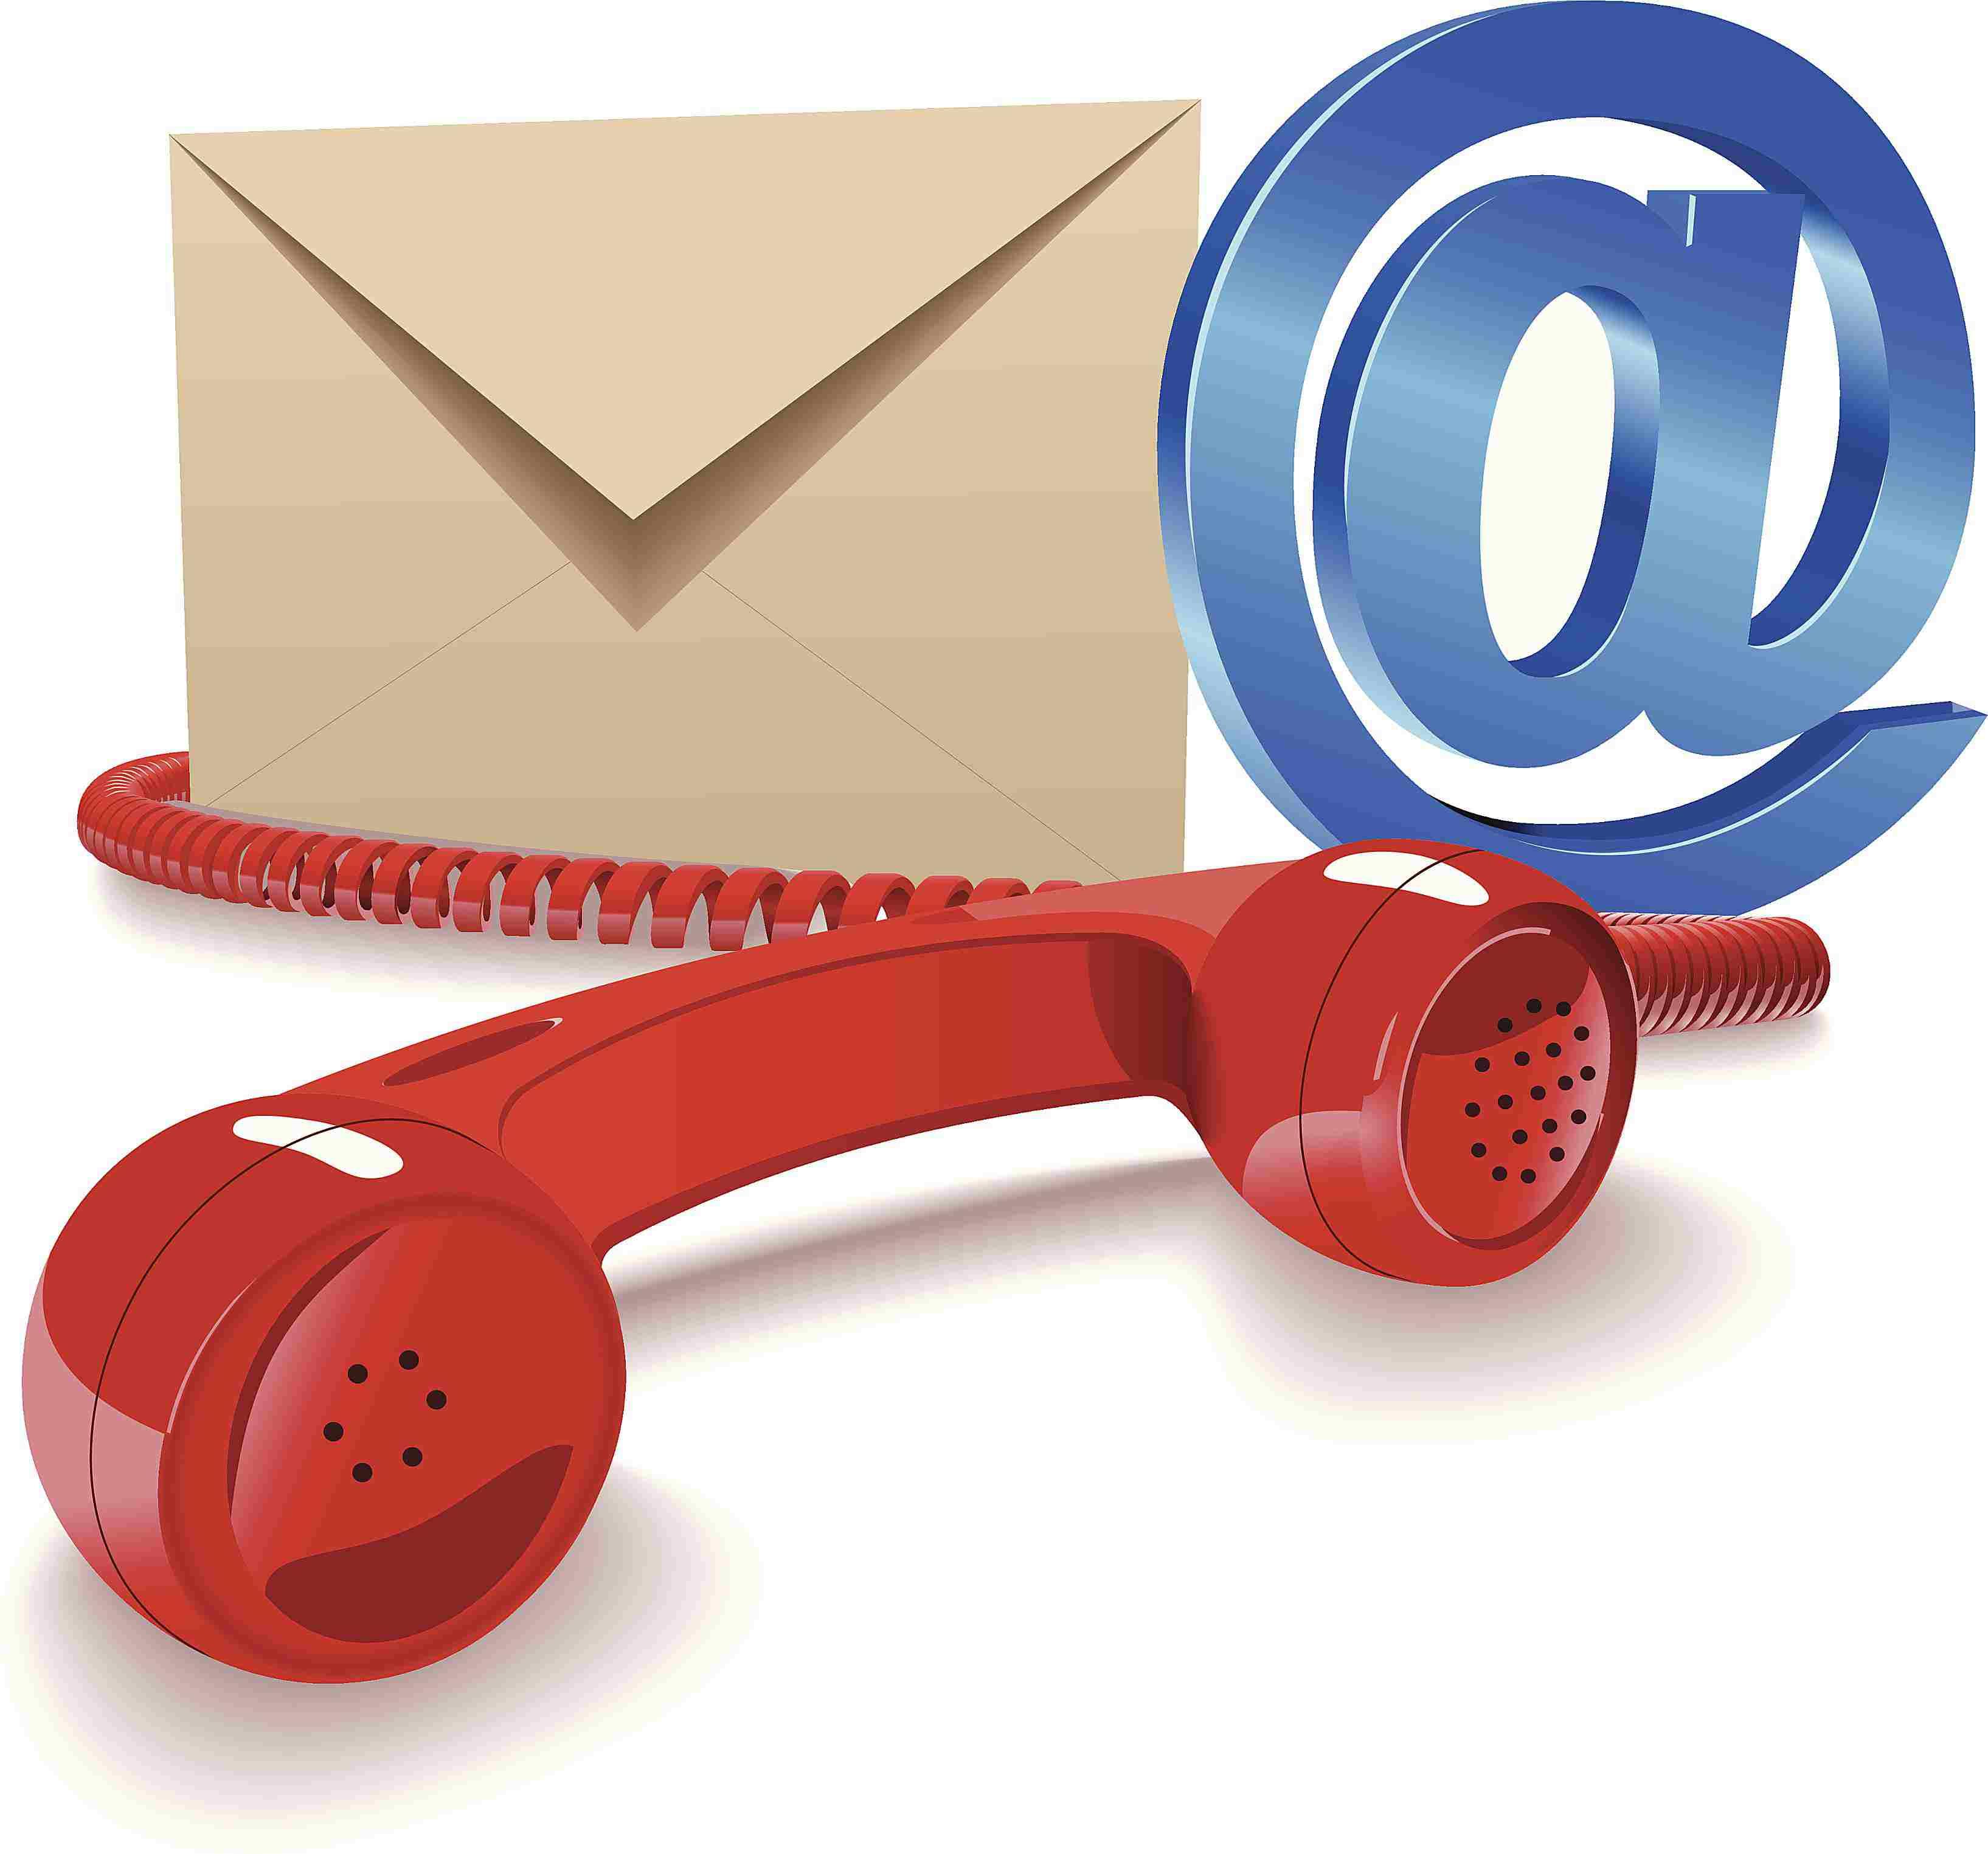 Representation of Phone, Email, Etc.